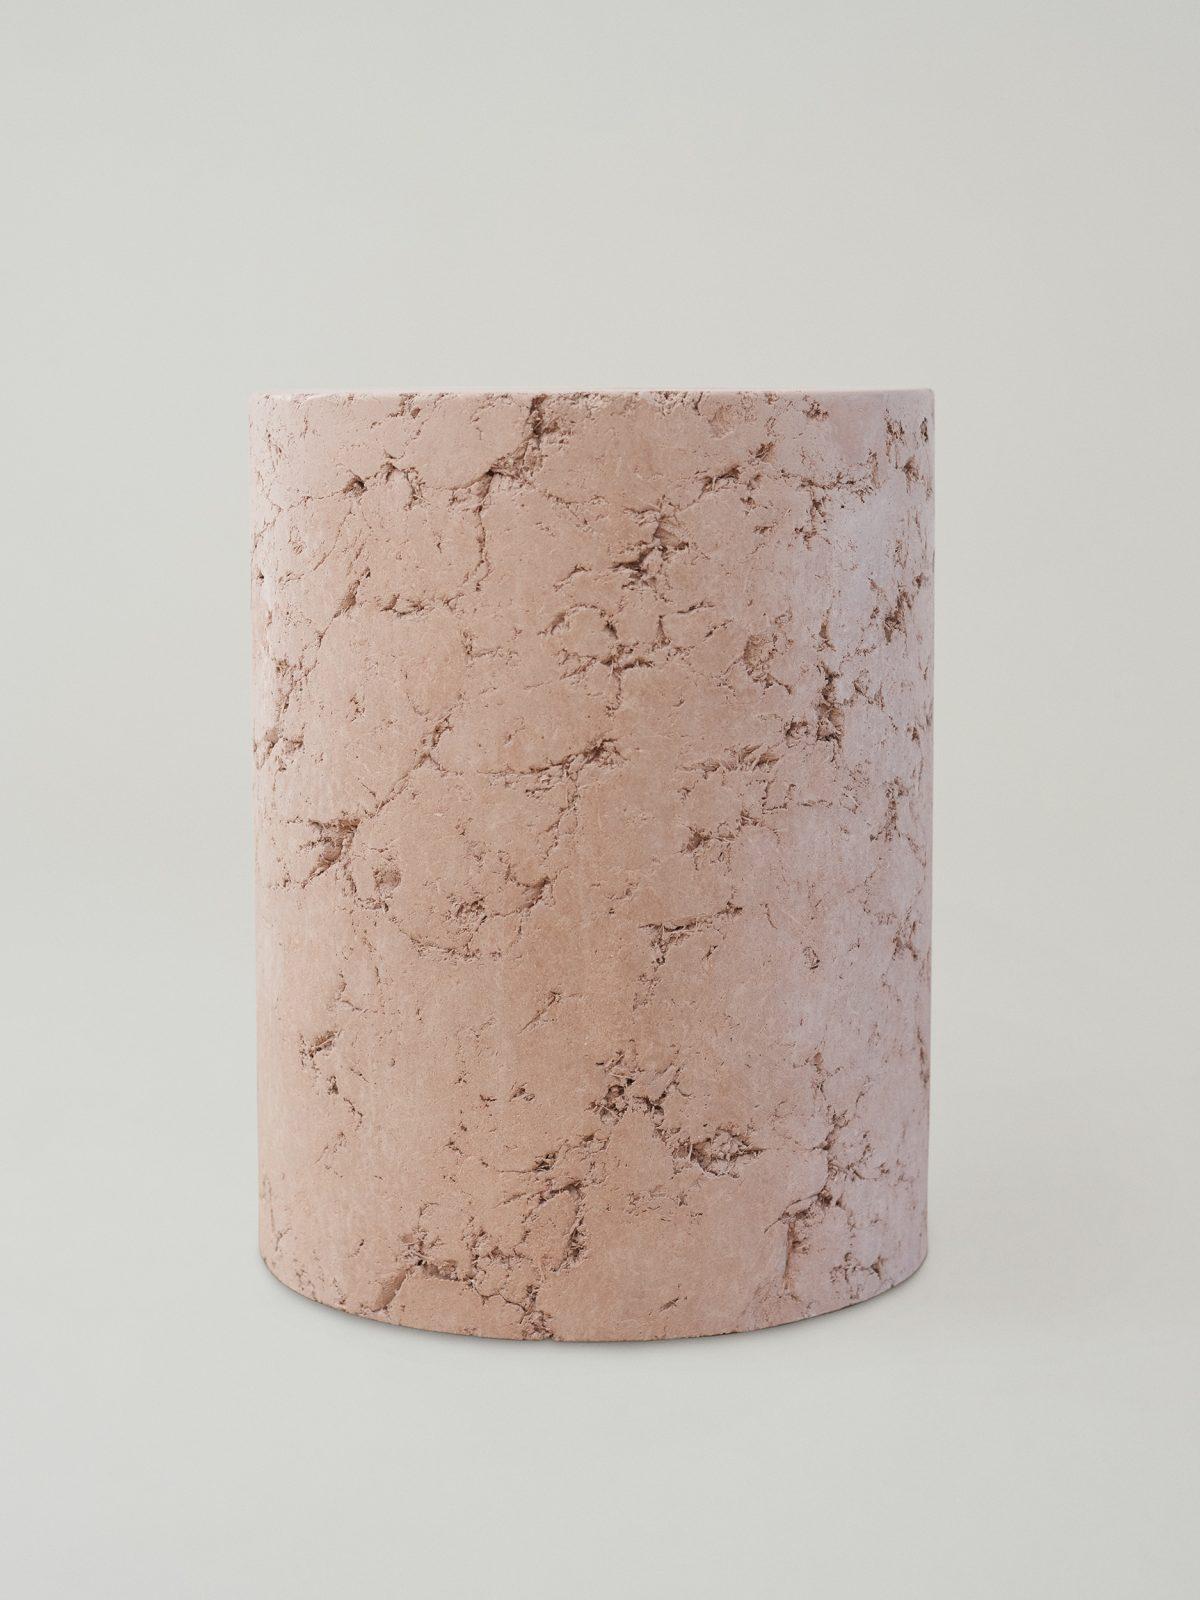 20200128 Daniel Boddam10656 landscape cream